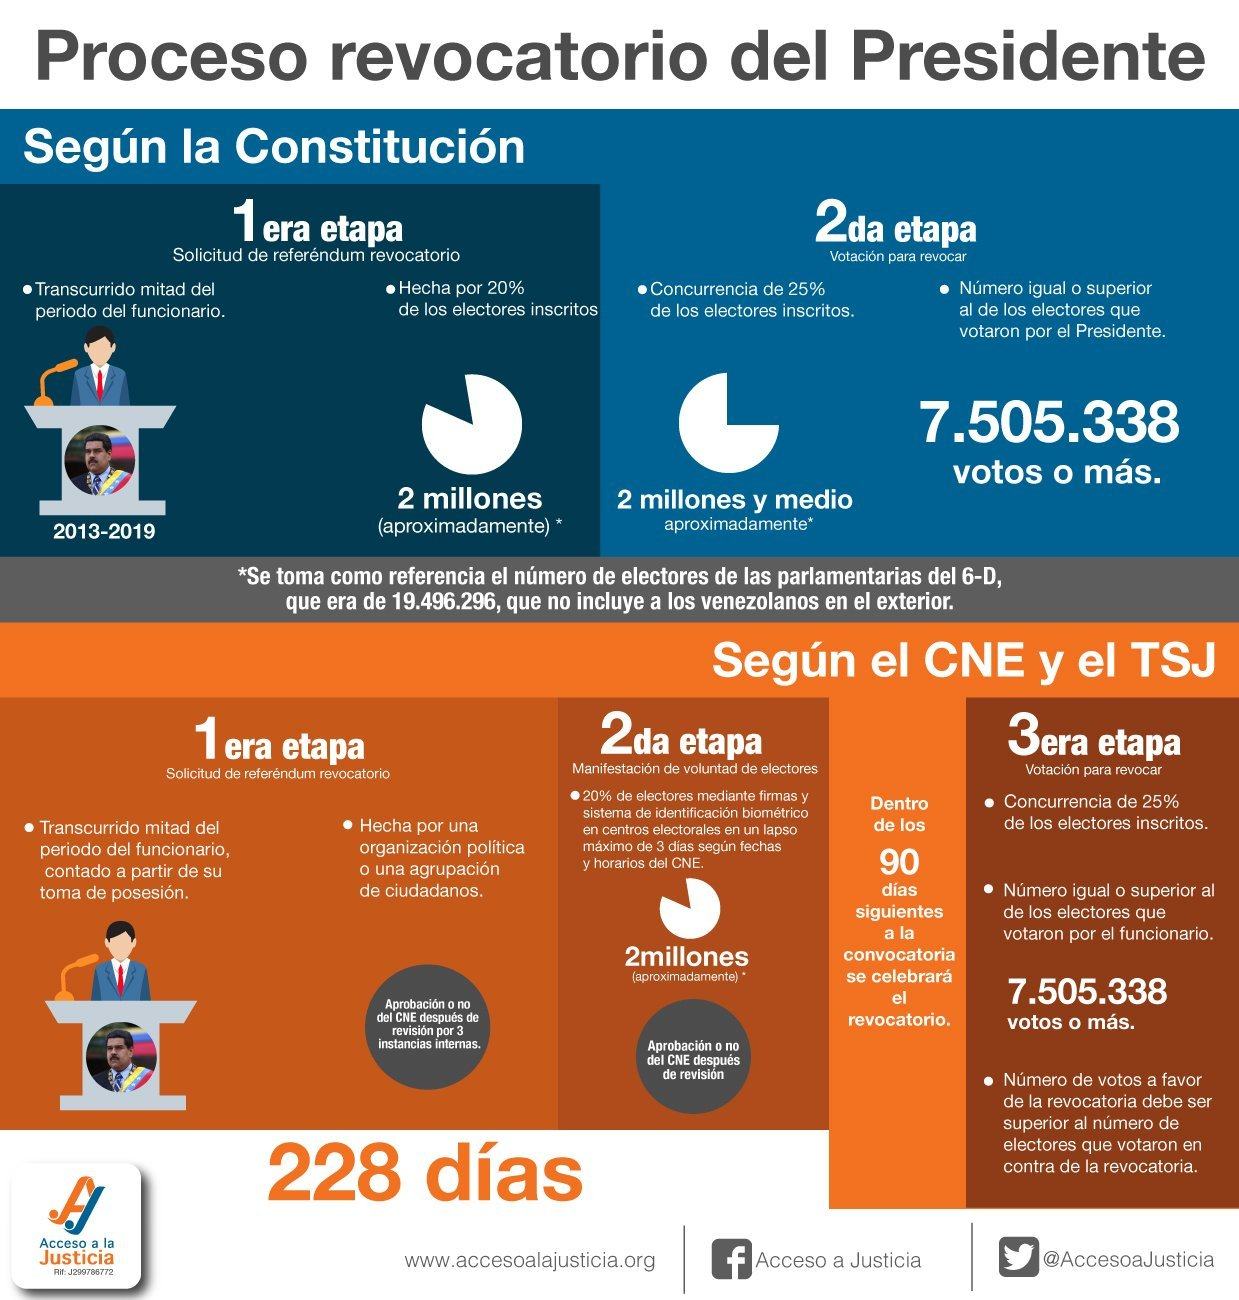 Procesos de revocatorio presidencial